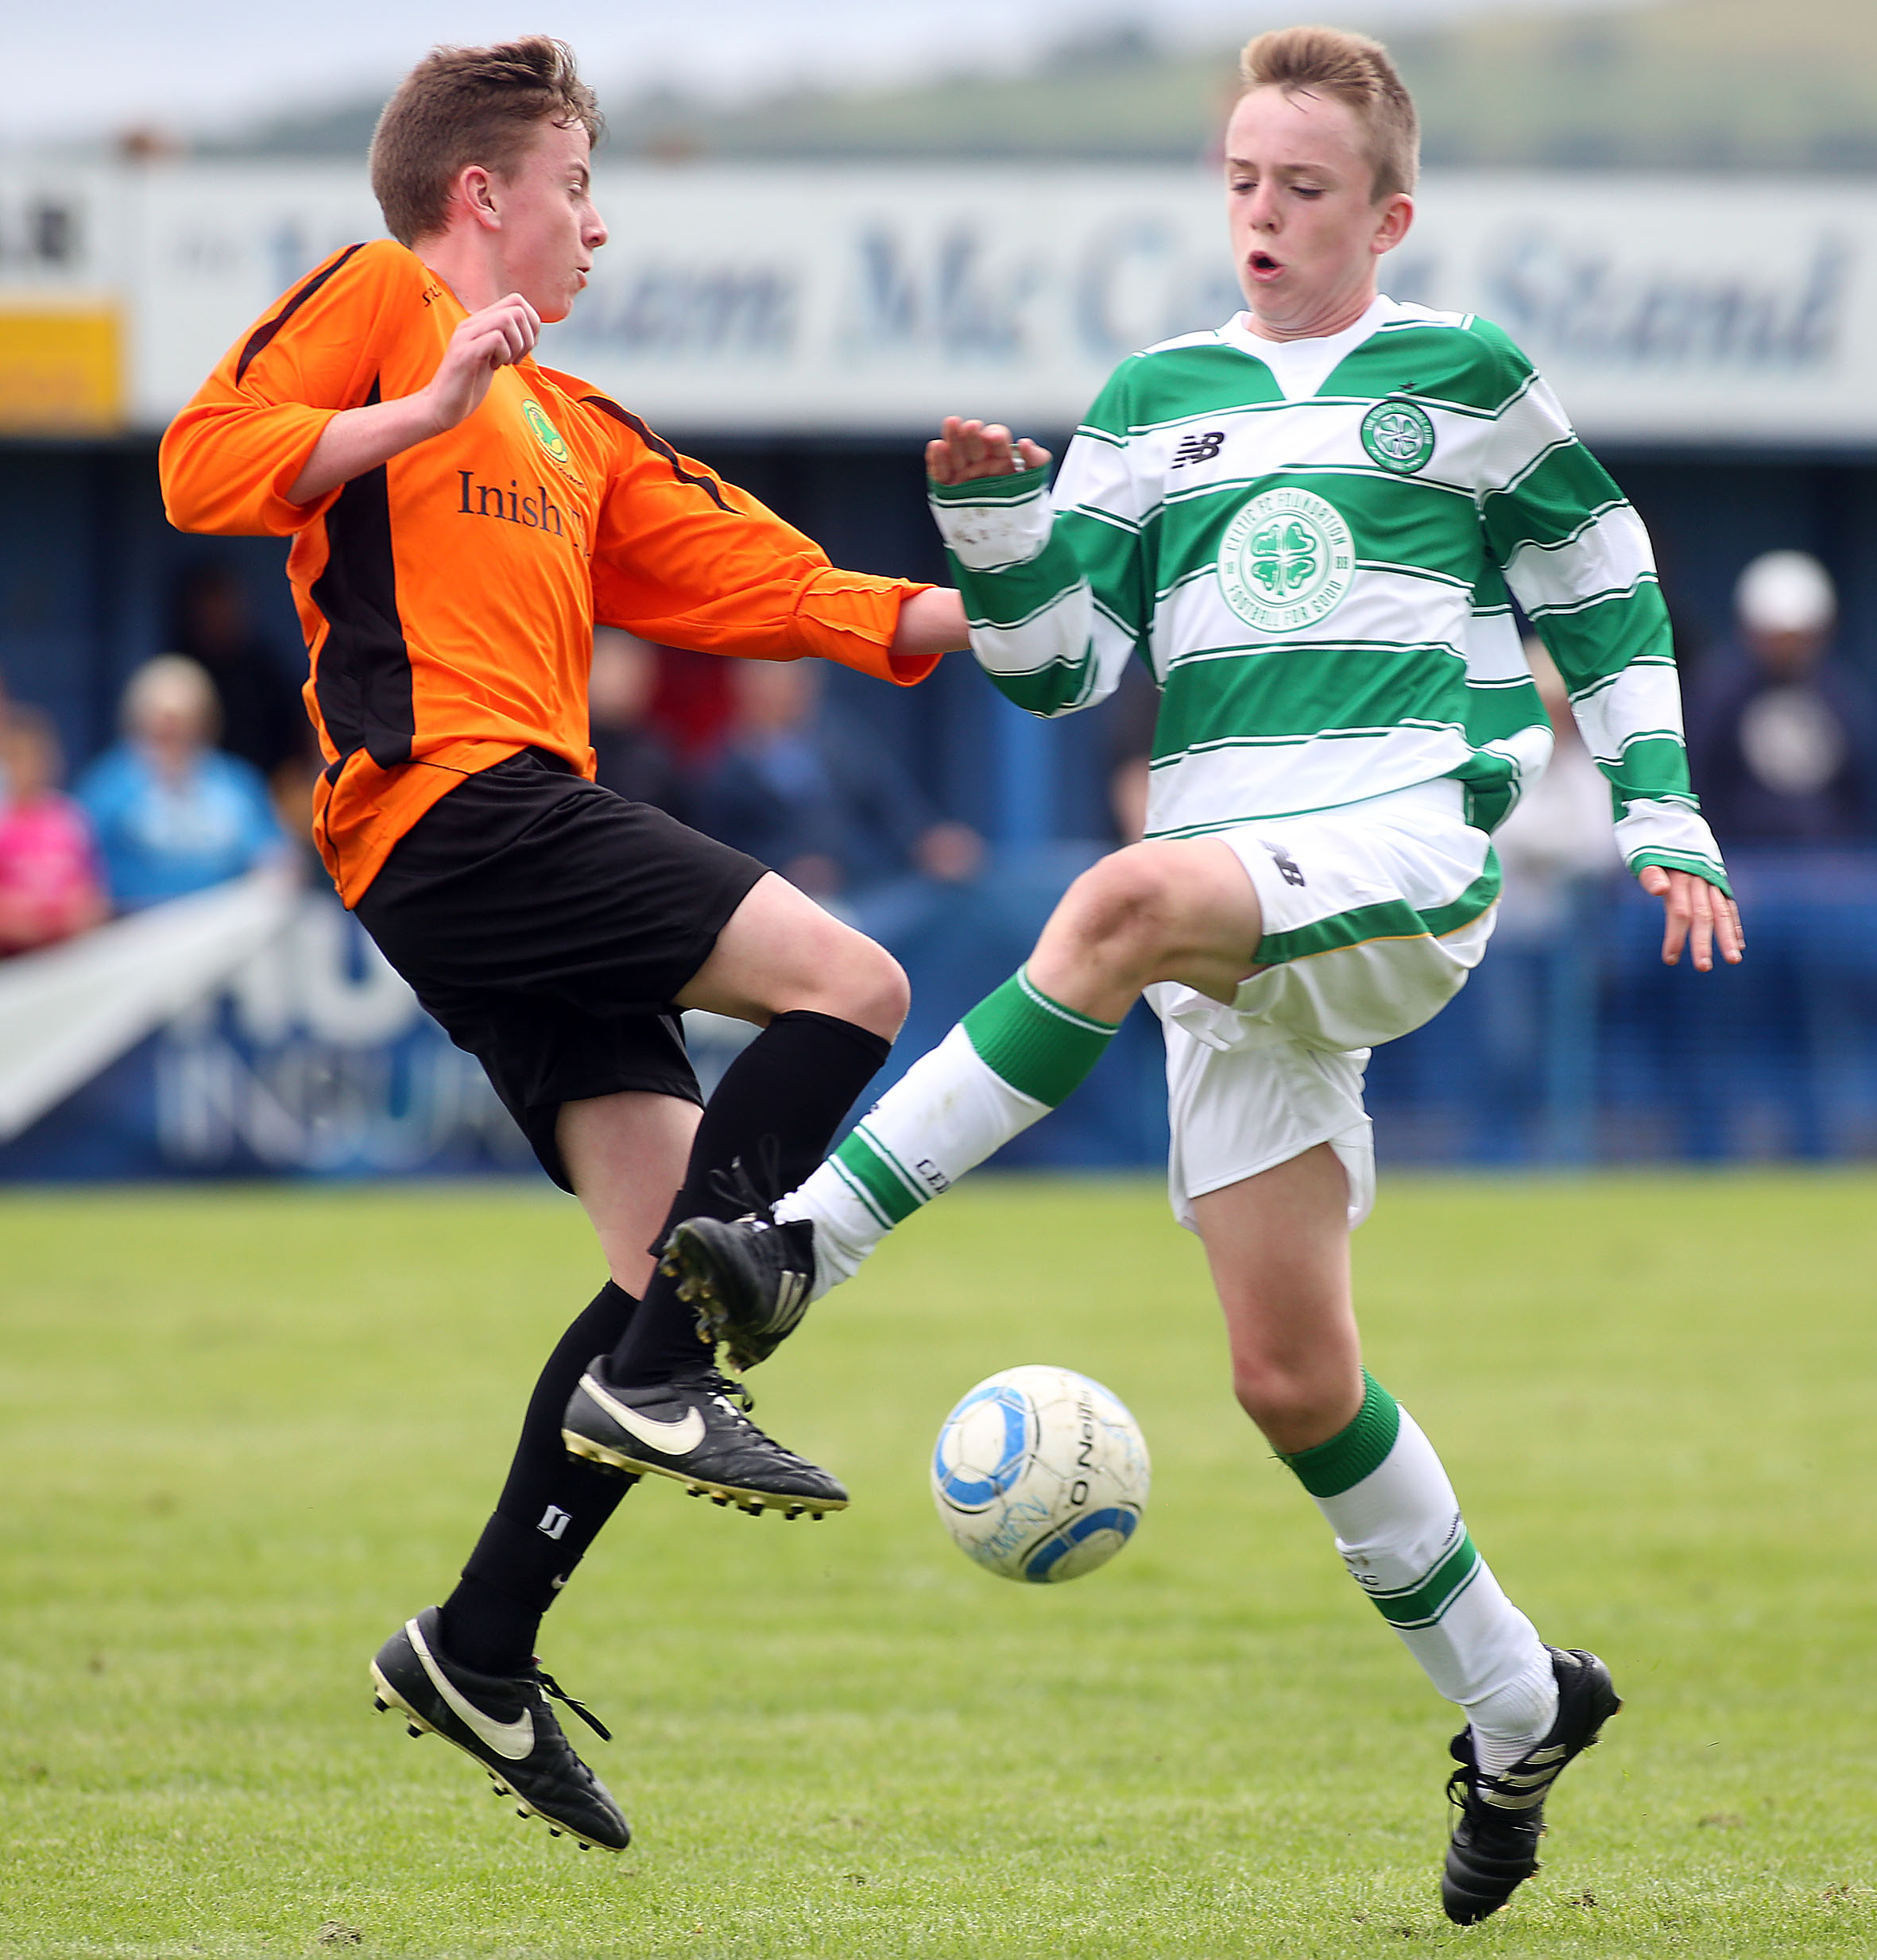 U-14 Celtic V Inishowen 010